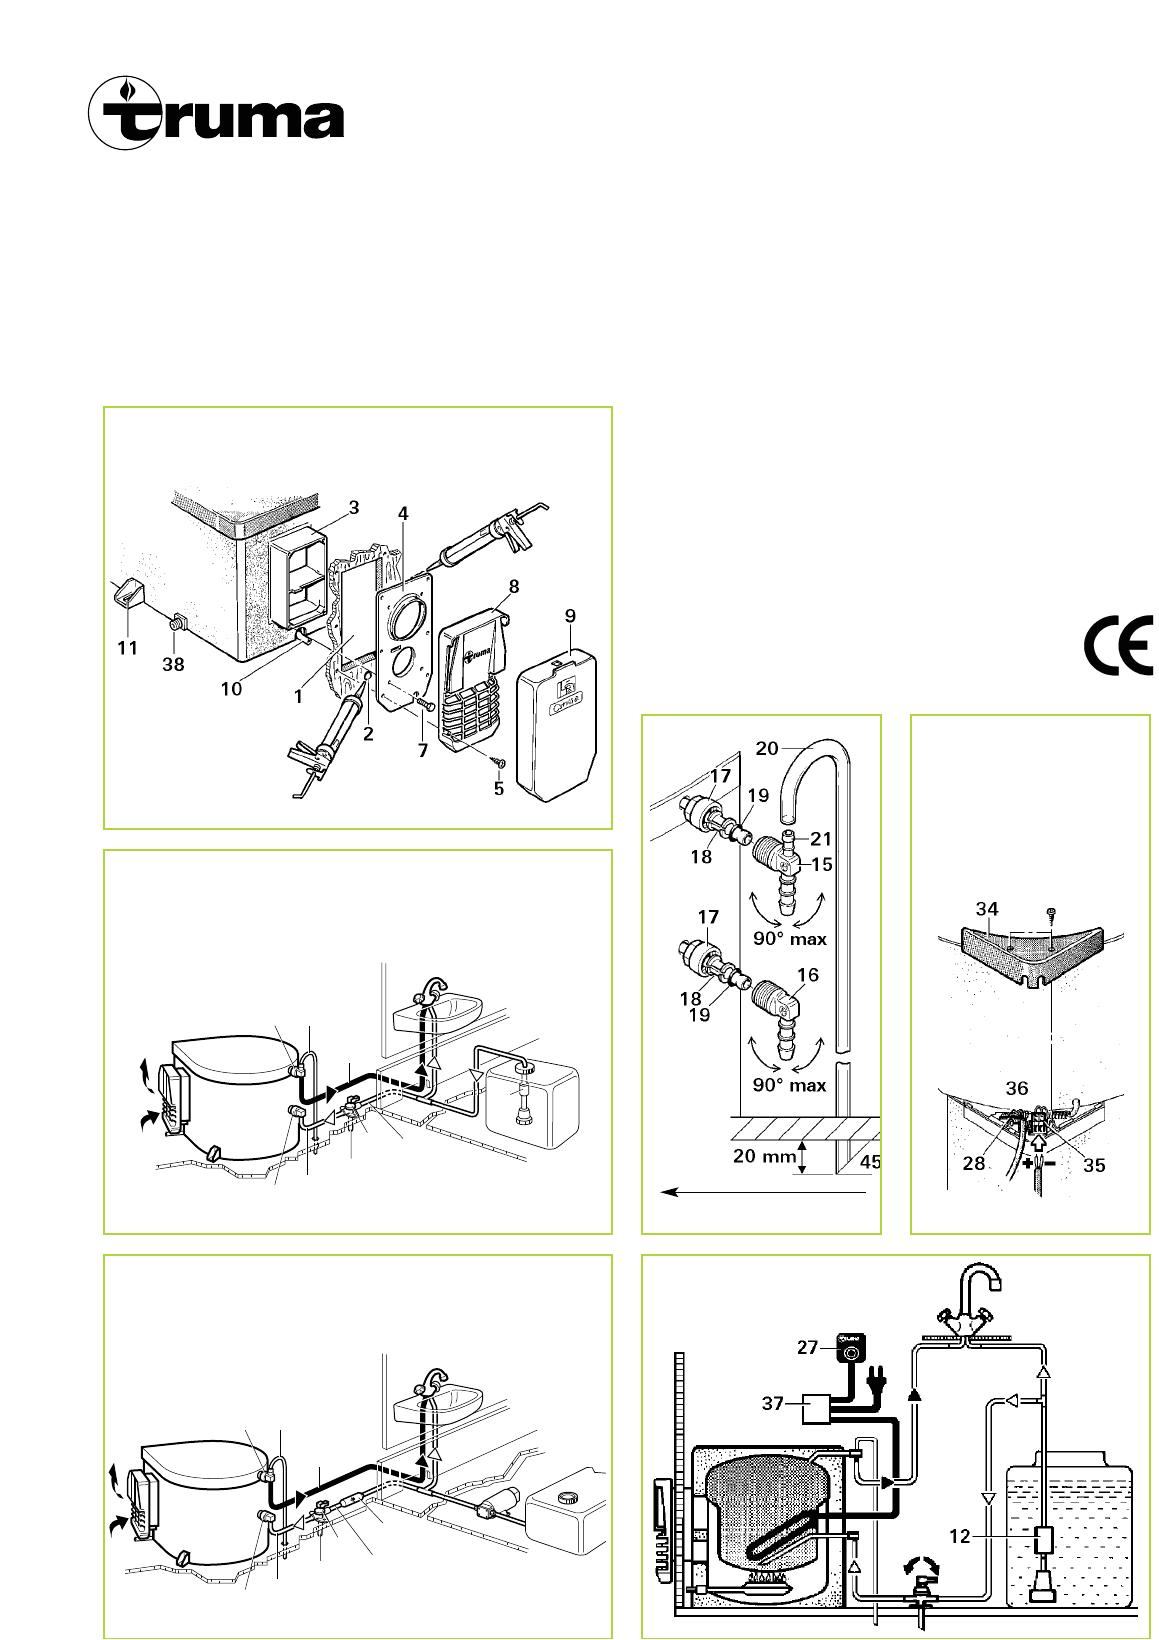 truma ultraheat wiring diagram inspirational manual truma ultrastore page 3 of 10 english